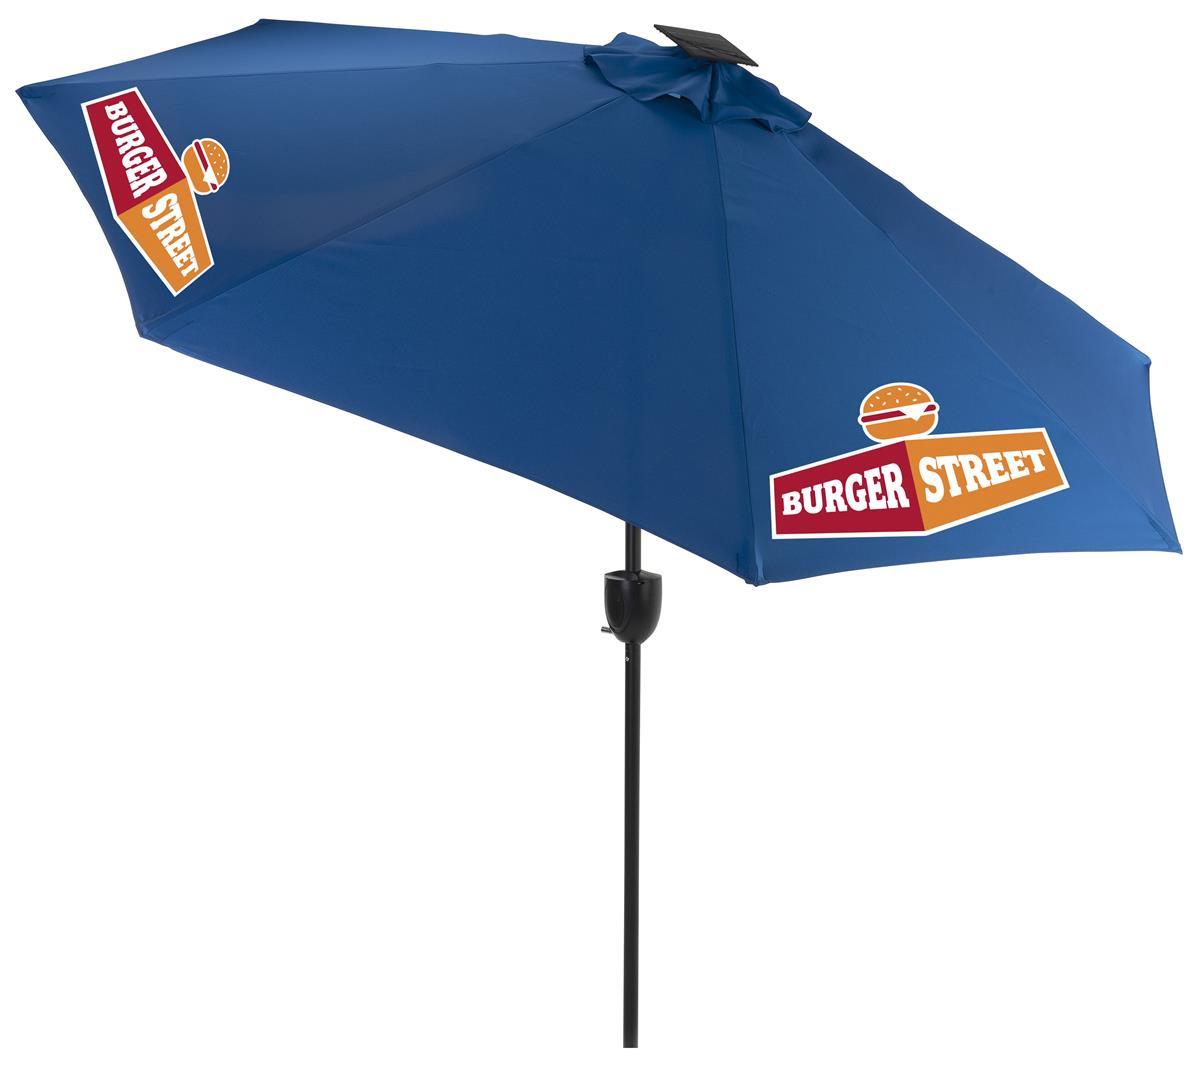 9 patio umbrella 3 color printing led lights bluetooth speaker royal blue